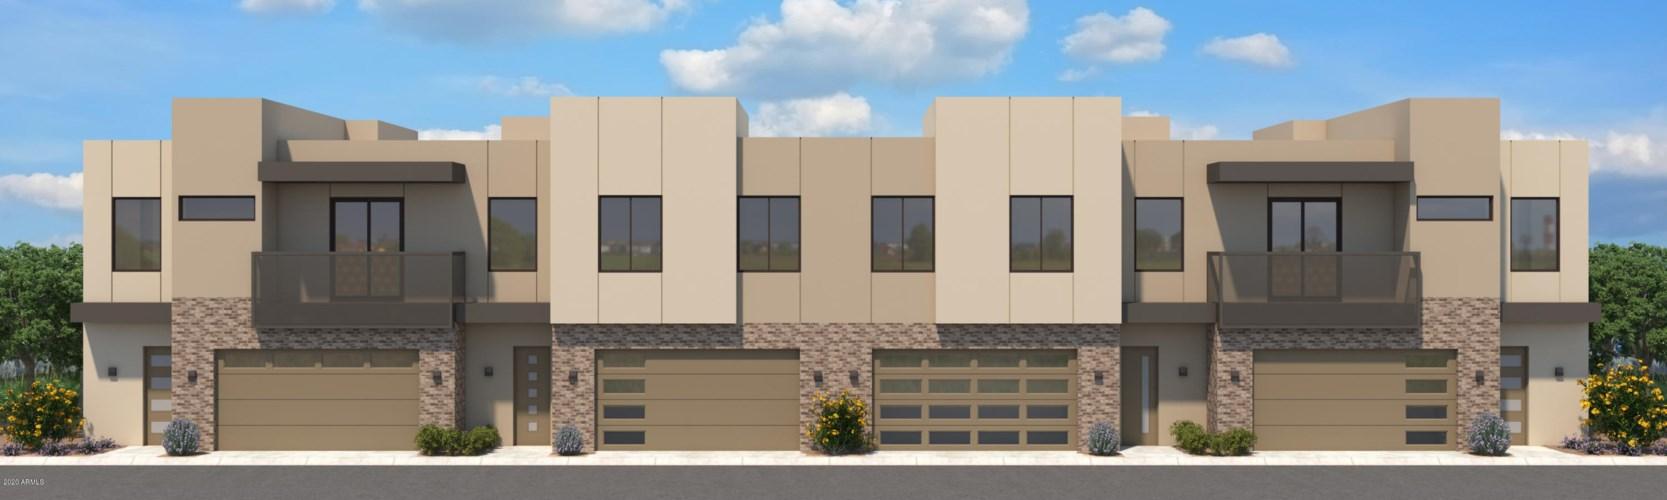 901 S Smith Road  #1048, Tempe, AZ 85281